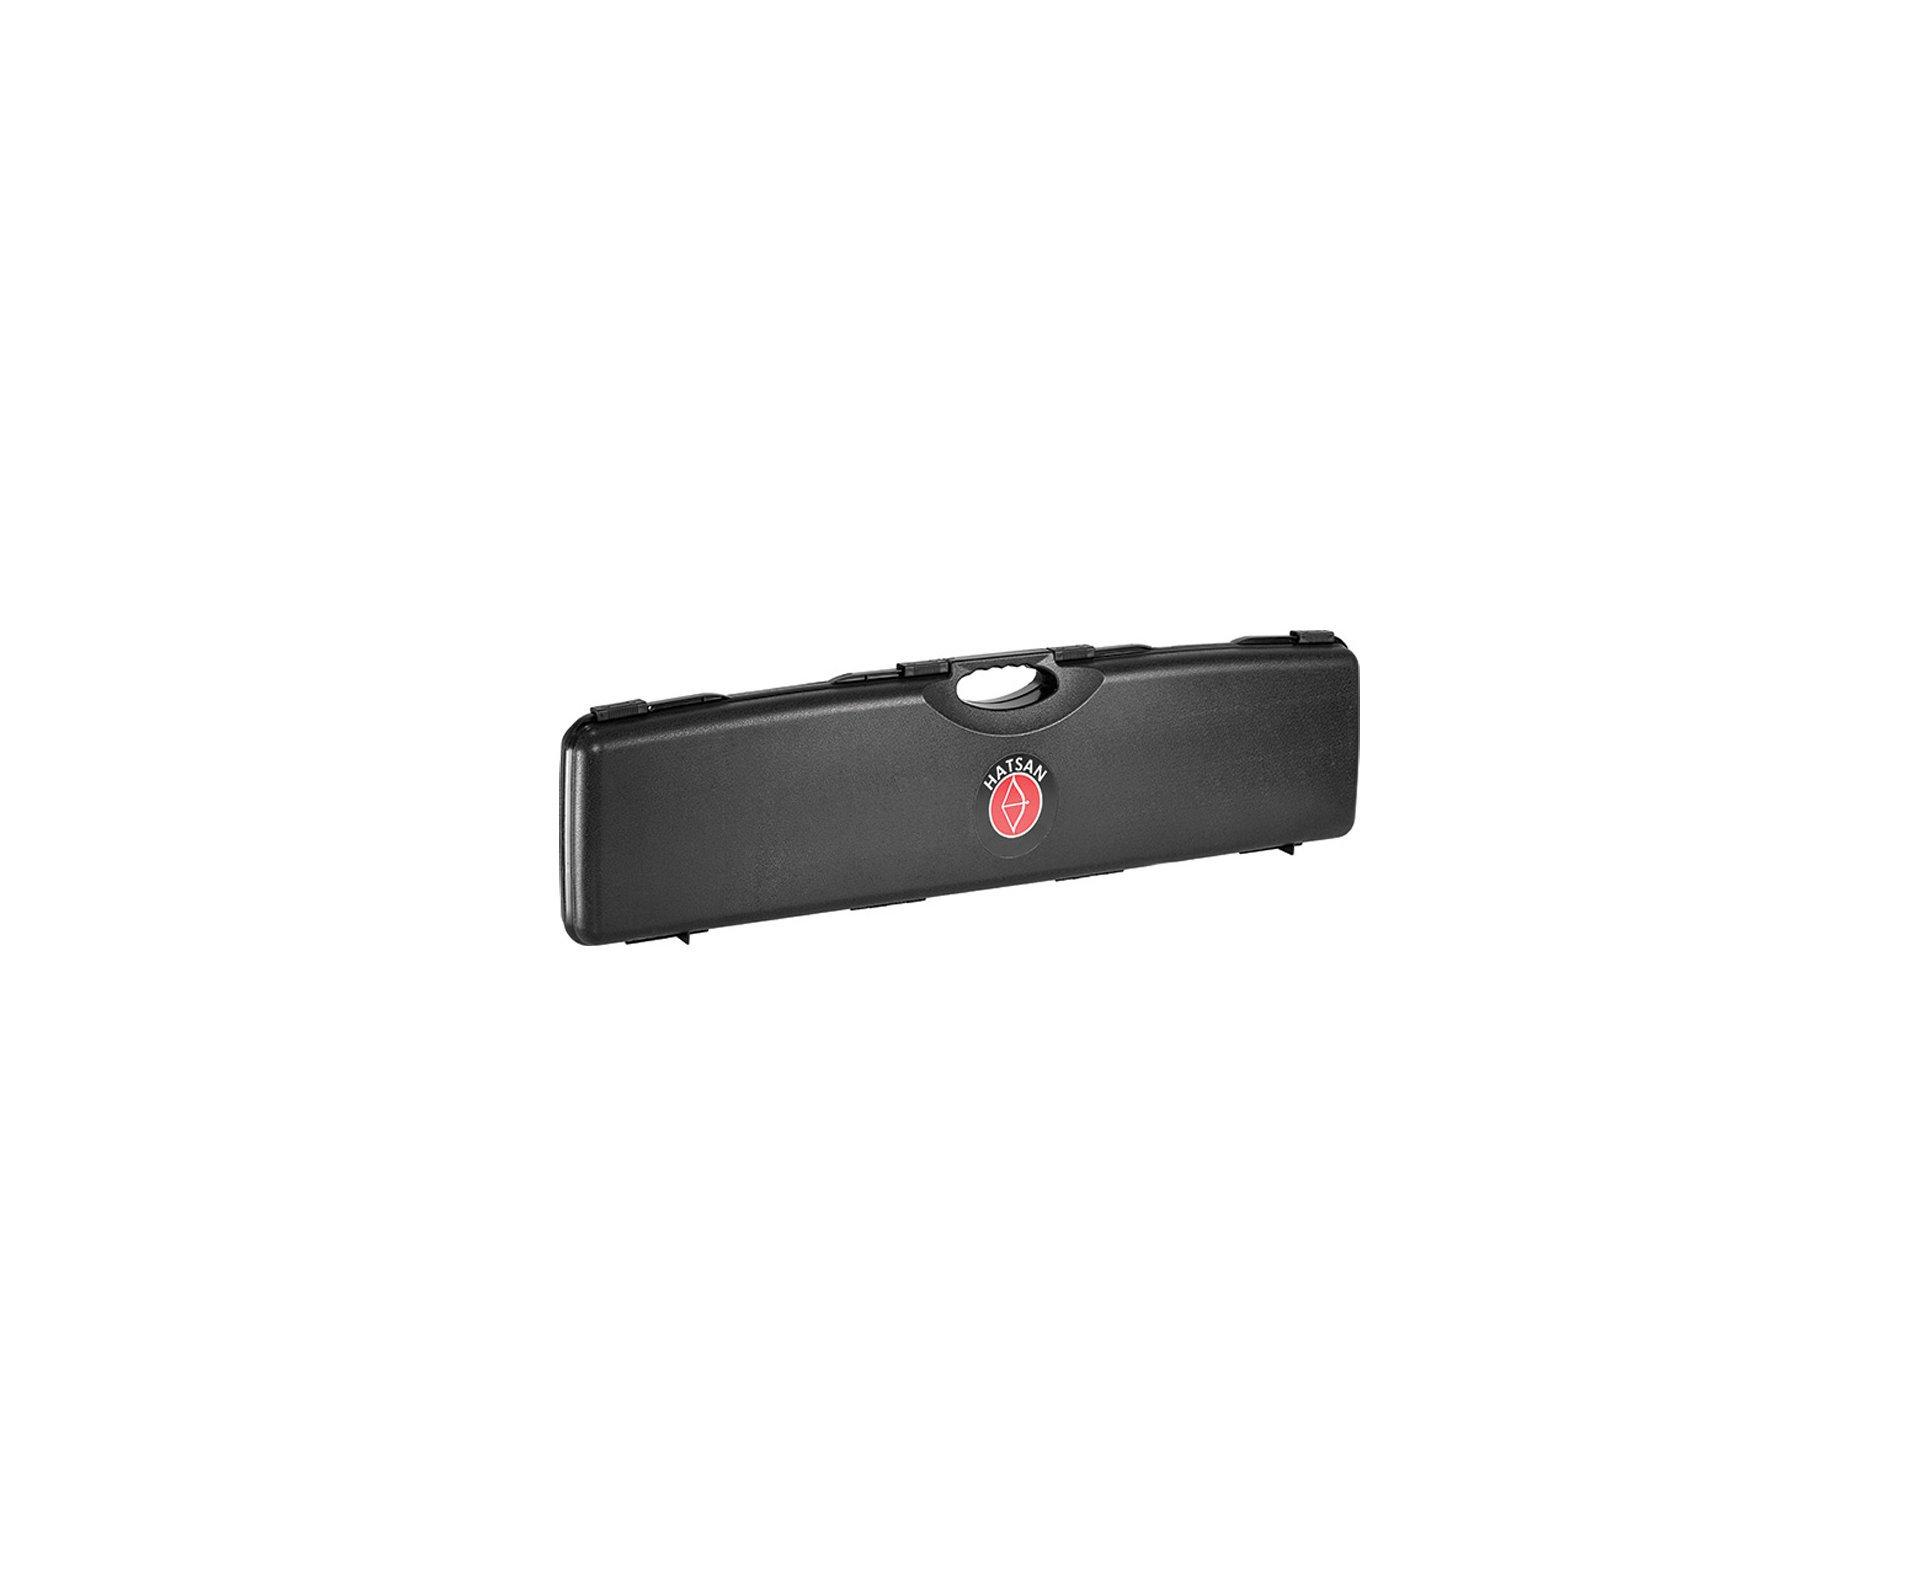 Carabina Pcp Hatsan Bt65sb Elite 5.5 + Case + Cilindro Extra + Bomba Pneumática